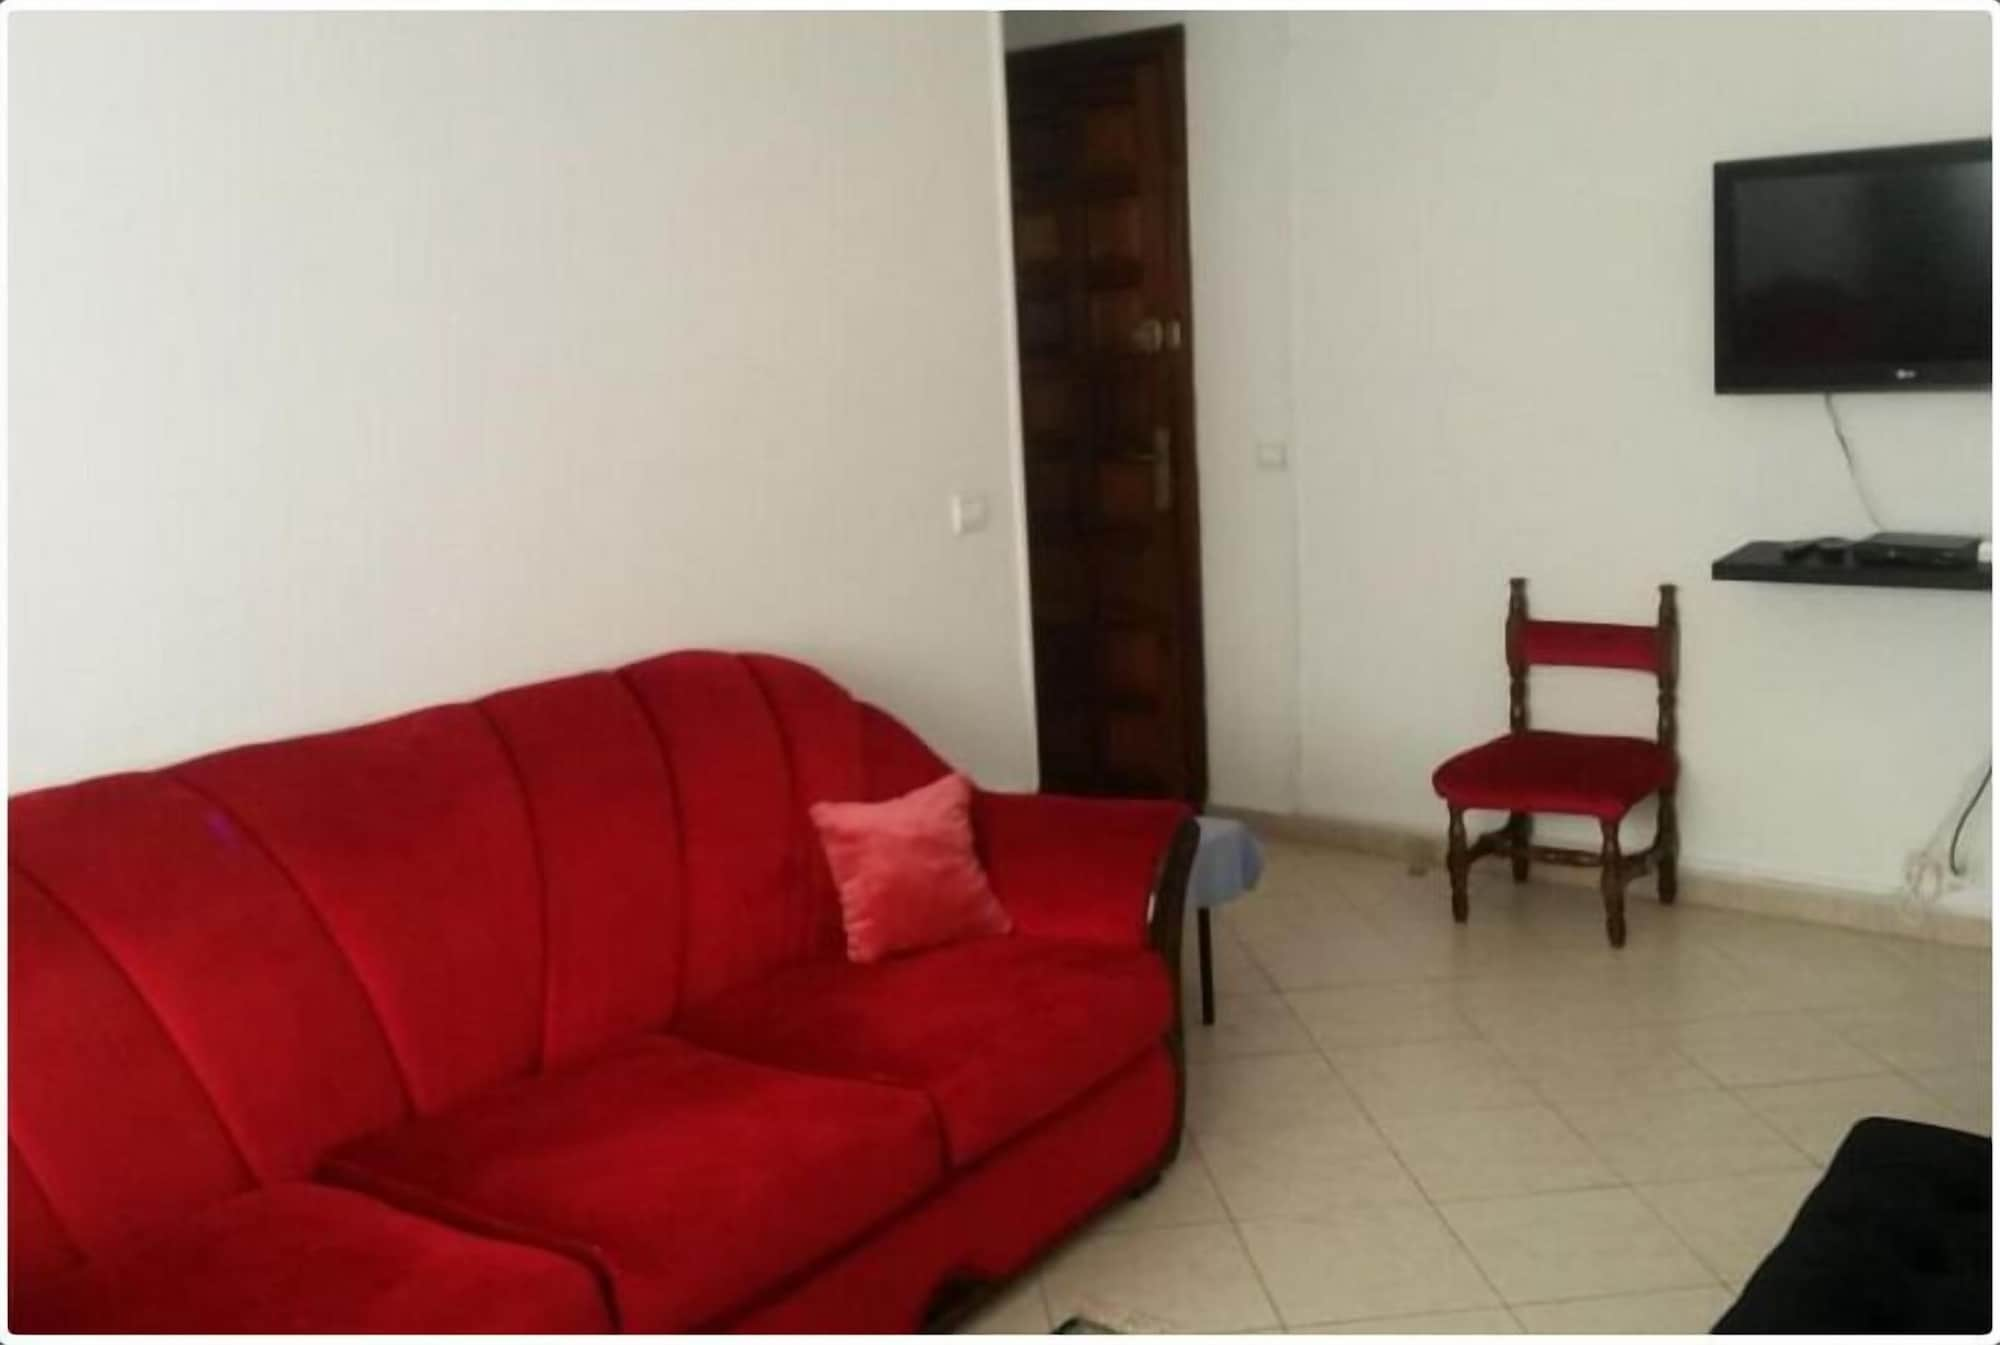 Agdal apartment hotel, Rabat